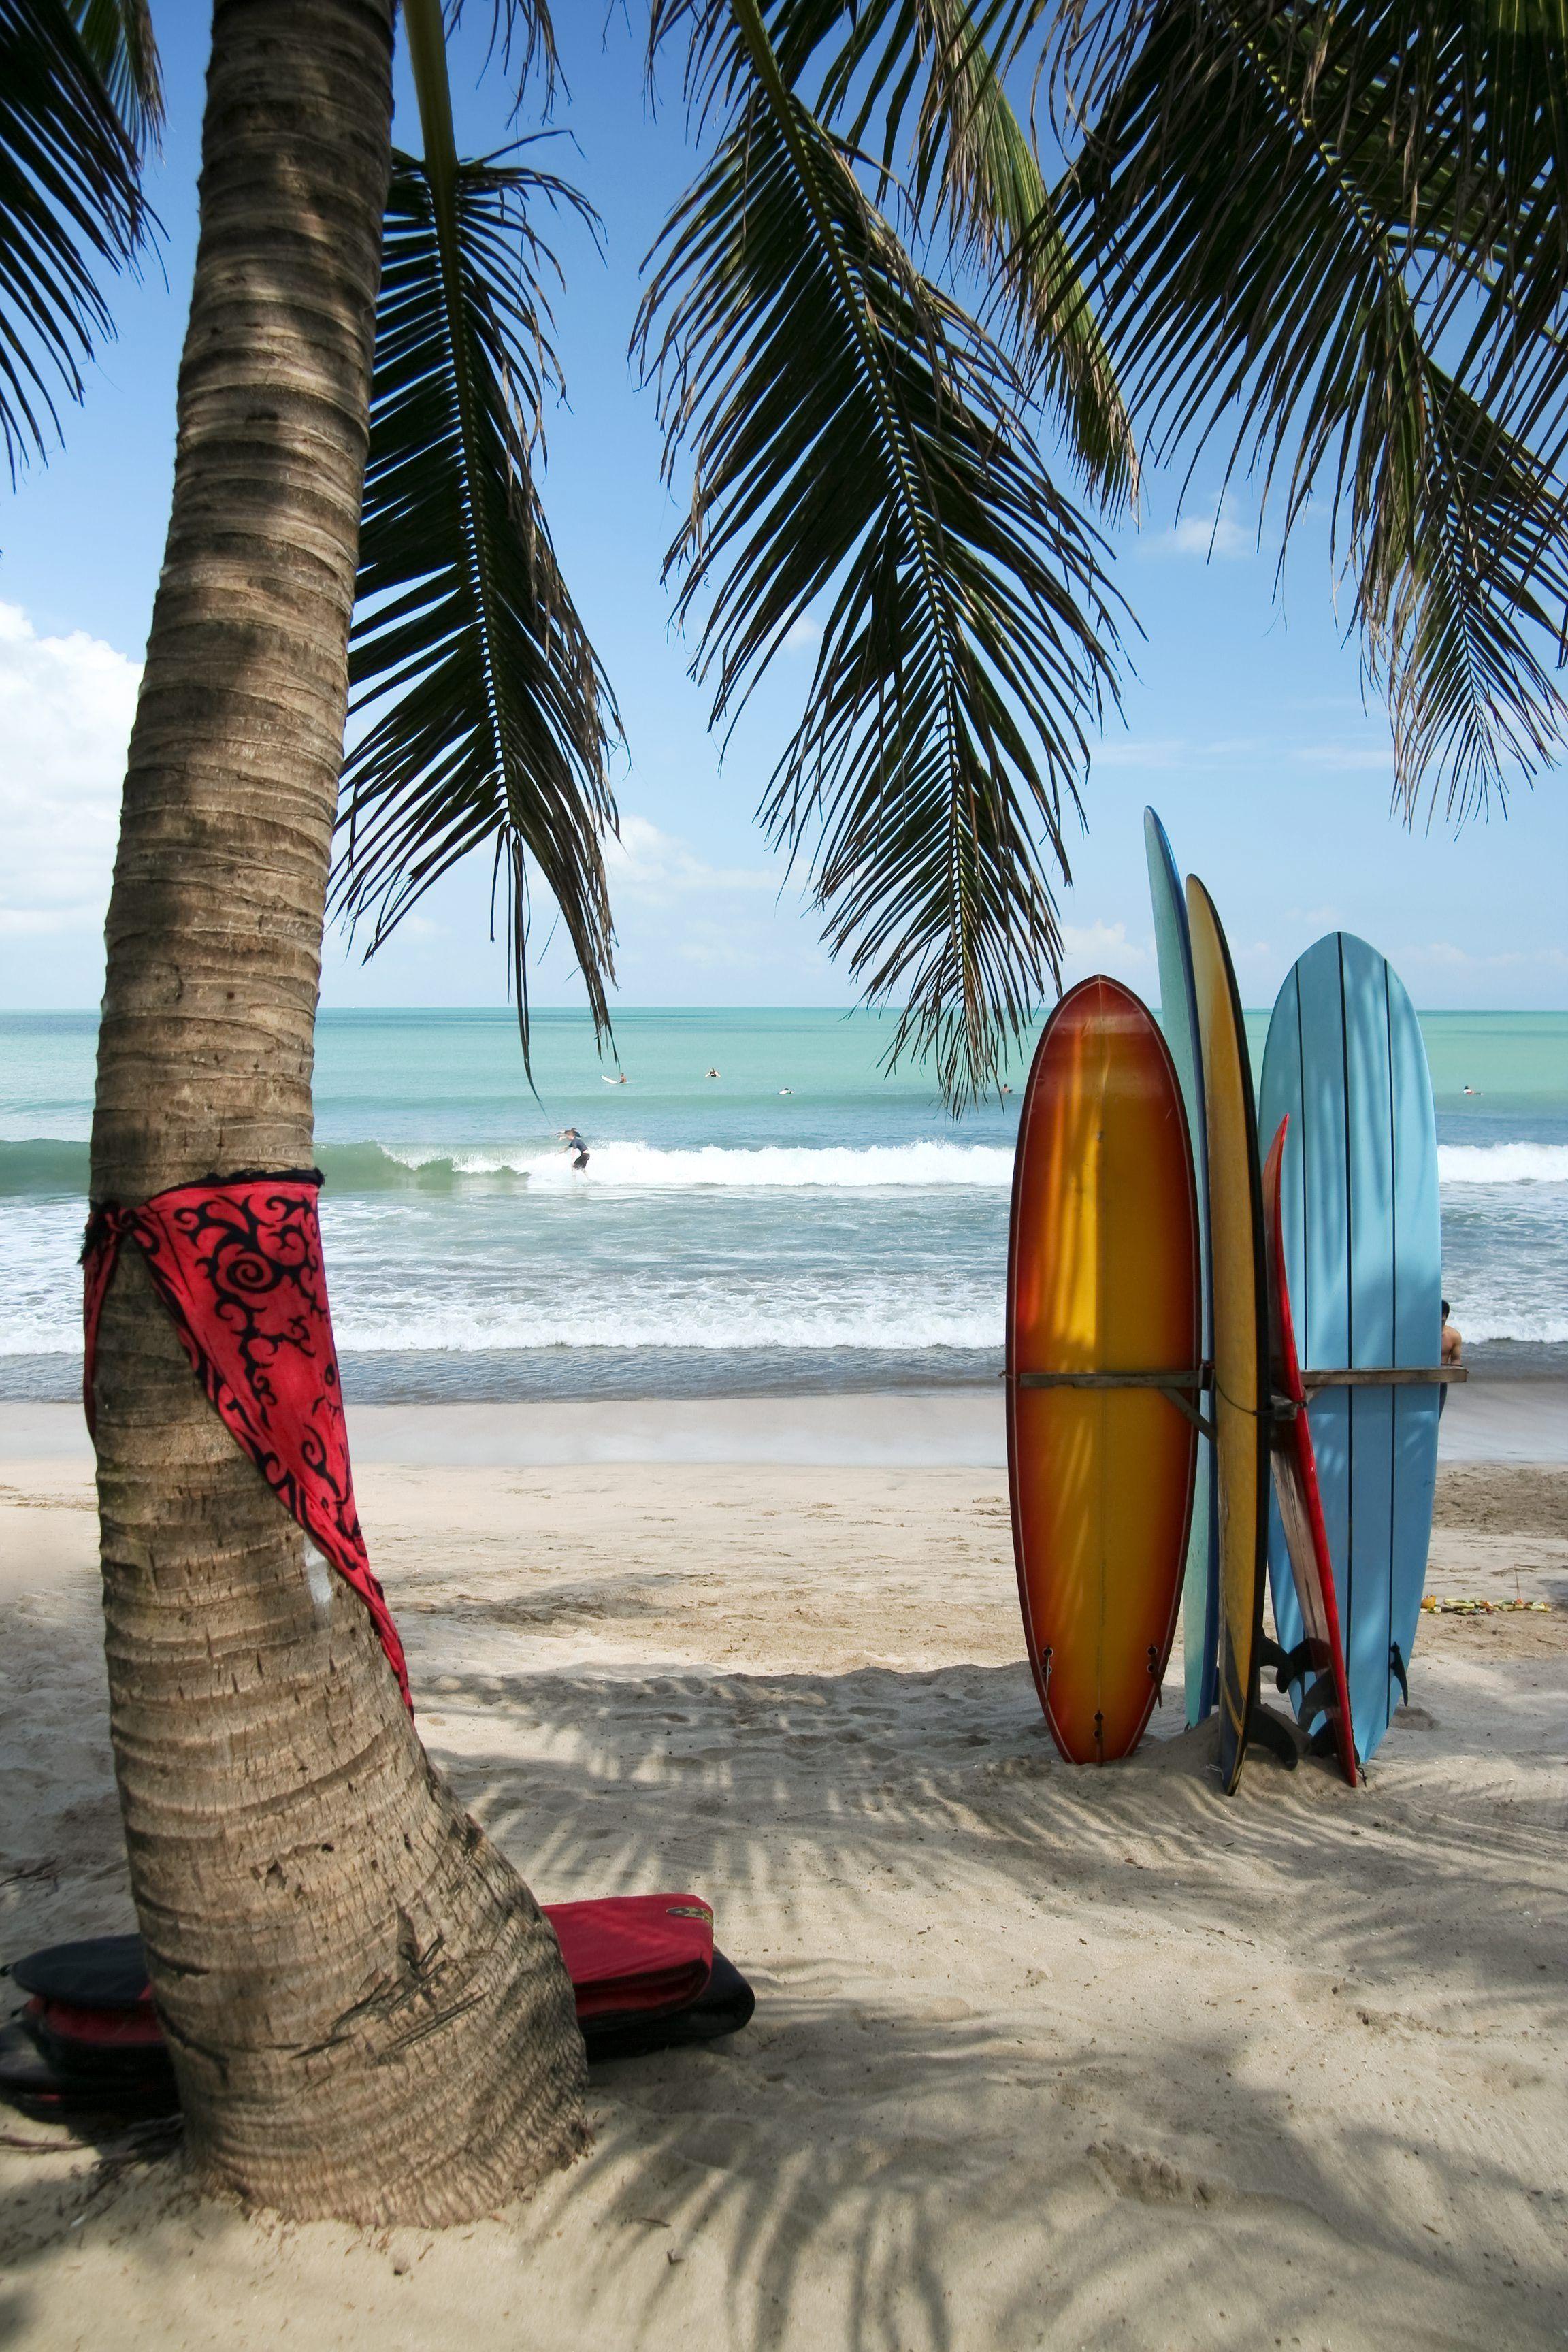 Pin van tuinederland op Indonesië Indonesië, Surfborden